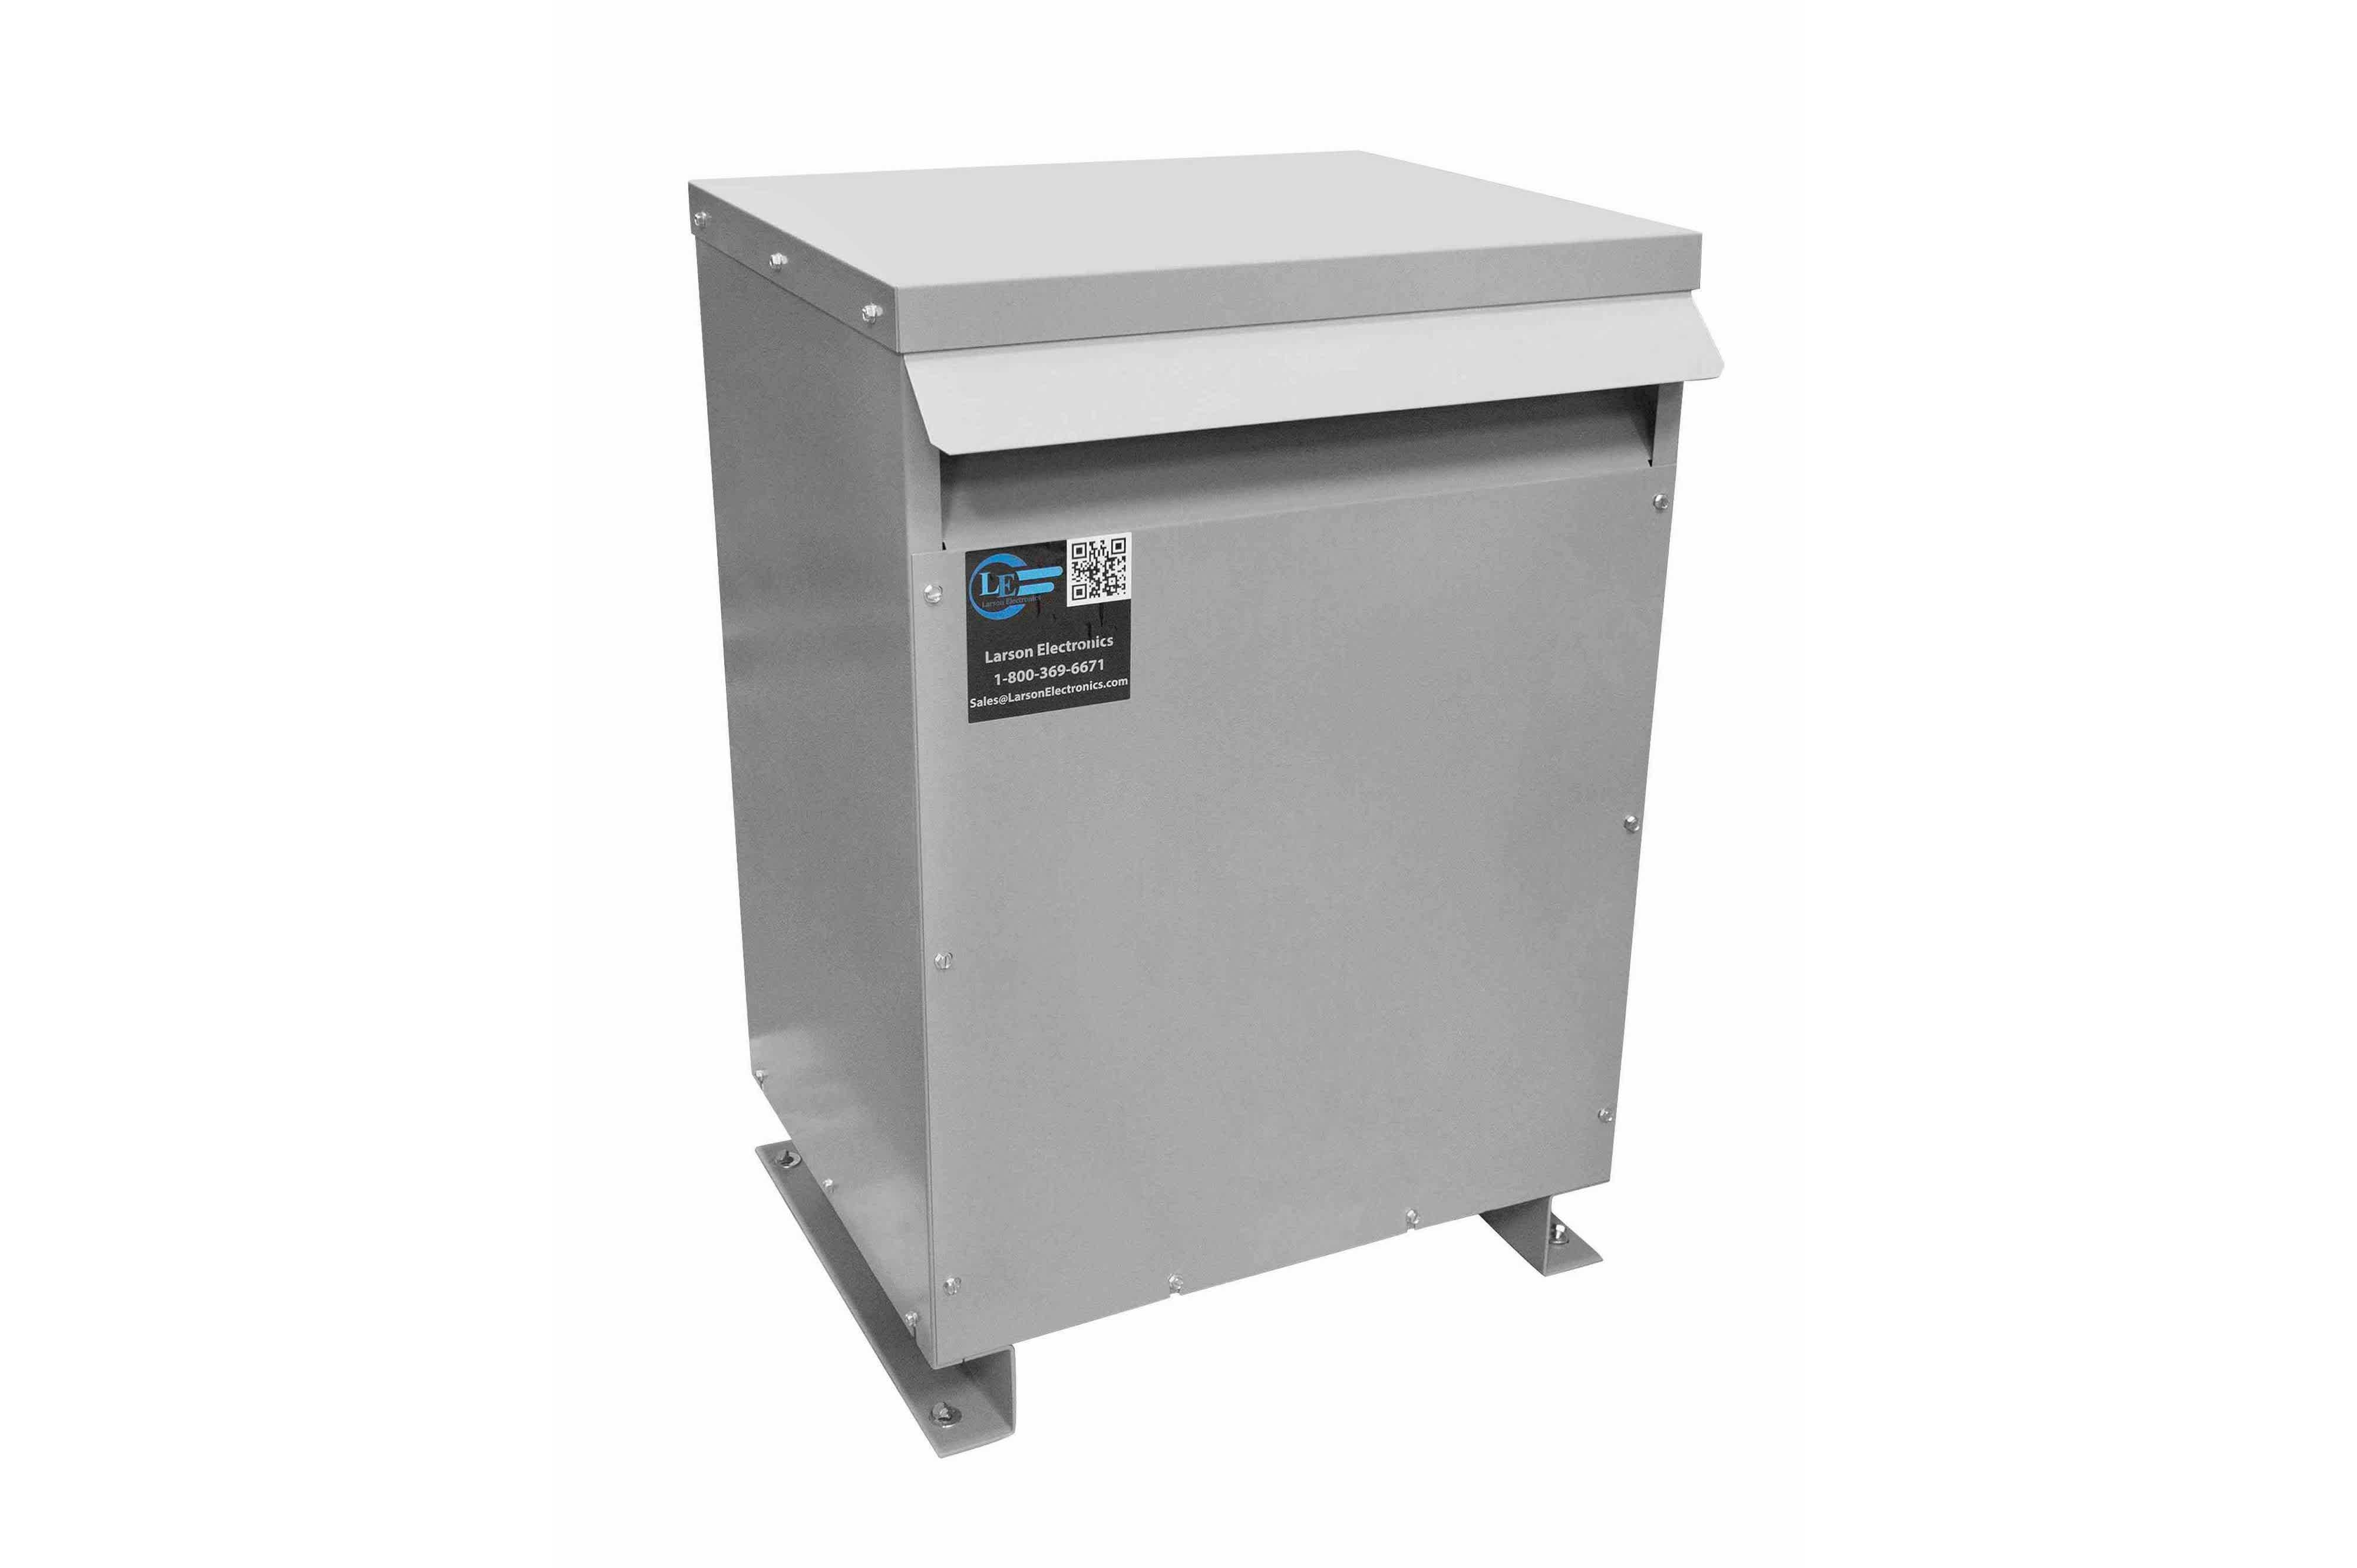 90 kVA 3PH Isolation Transformer, 415V Wye Primary, 240V Delta Secondary, N3R, Ventilated, 60 Hz